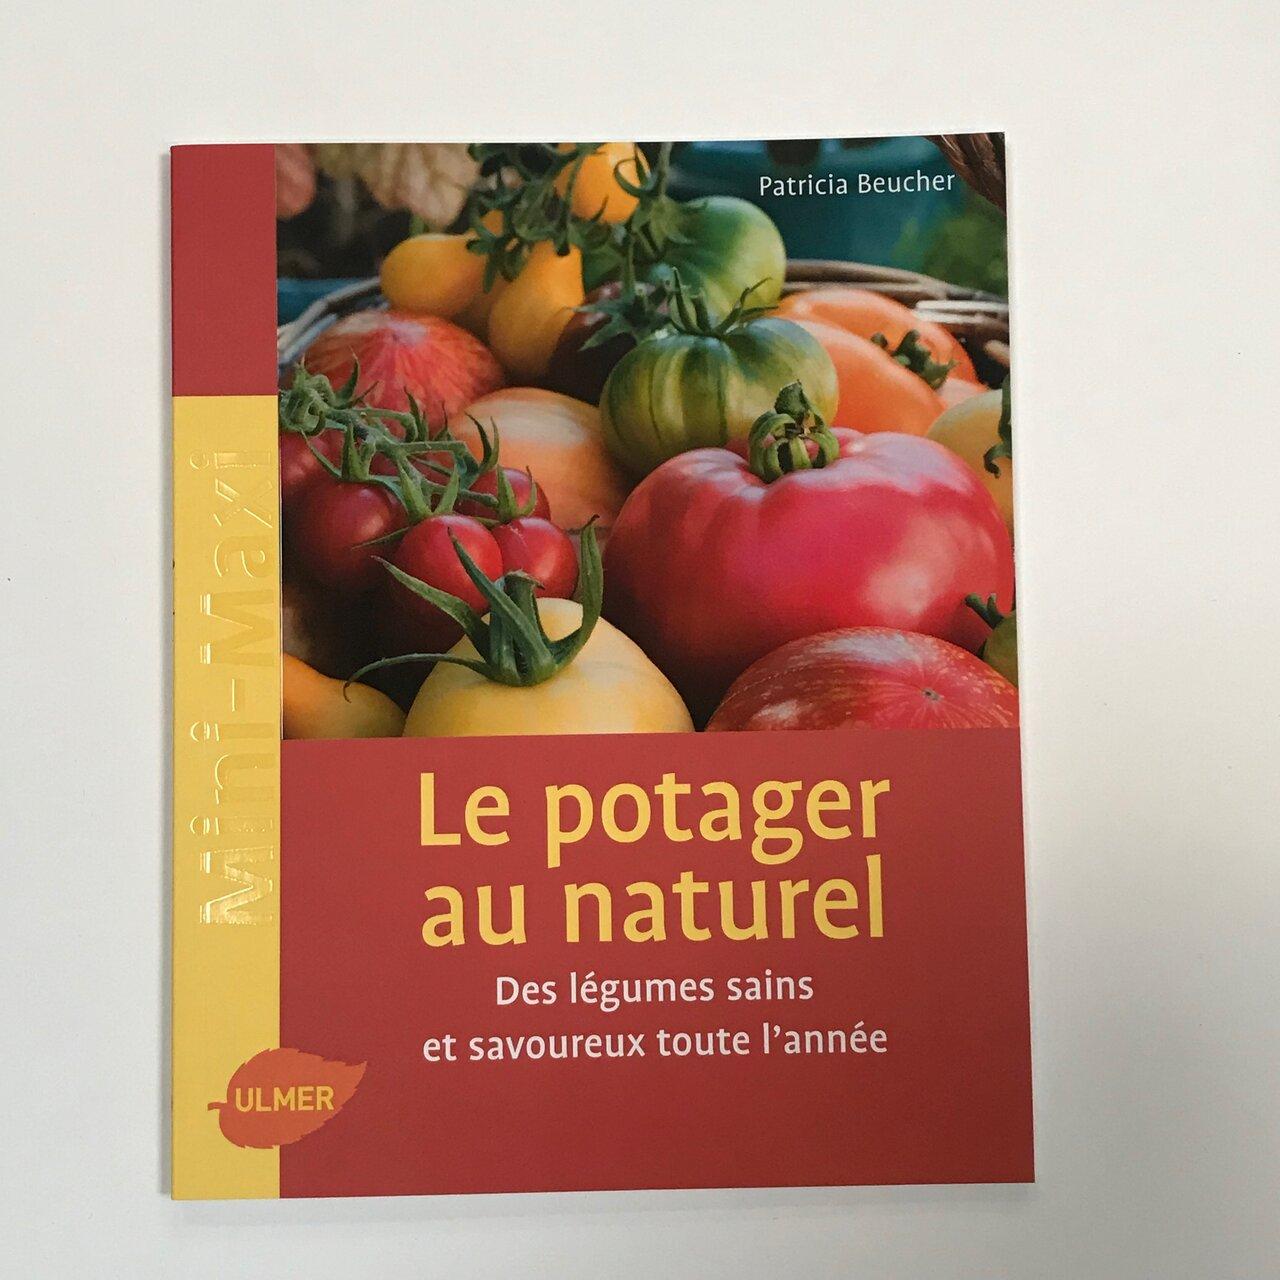 Jardinage - Le potager au naturel